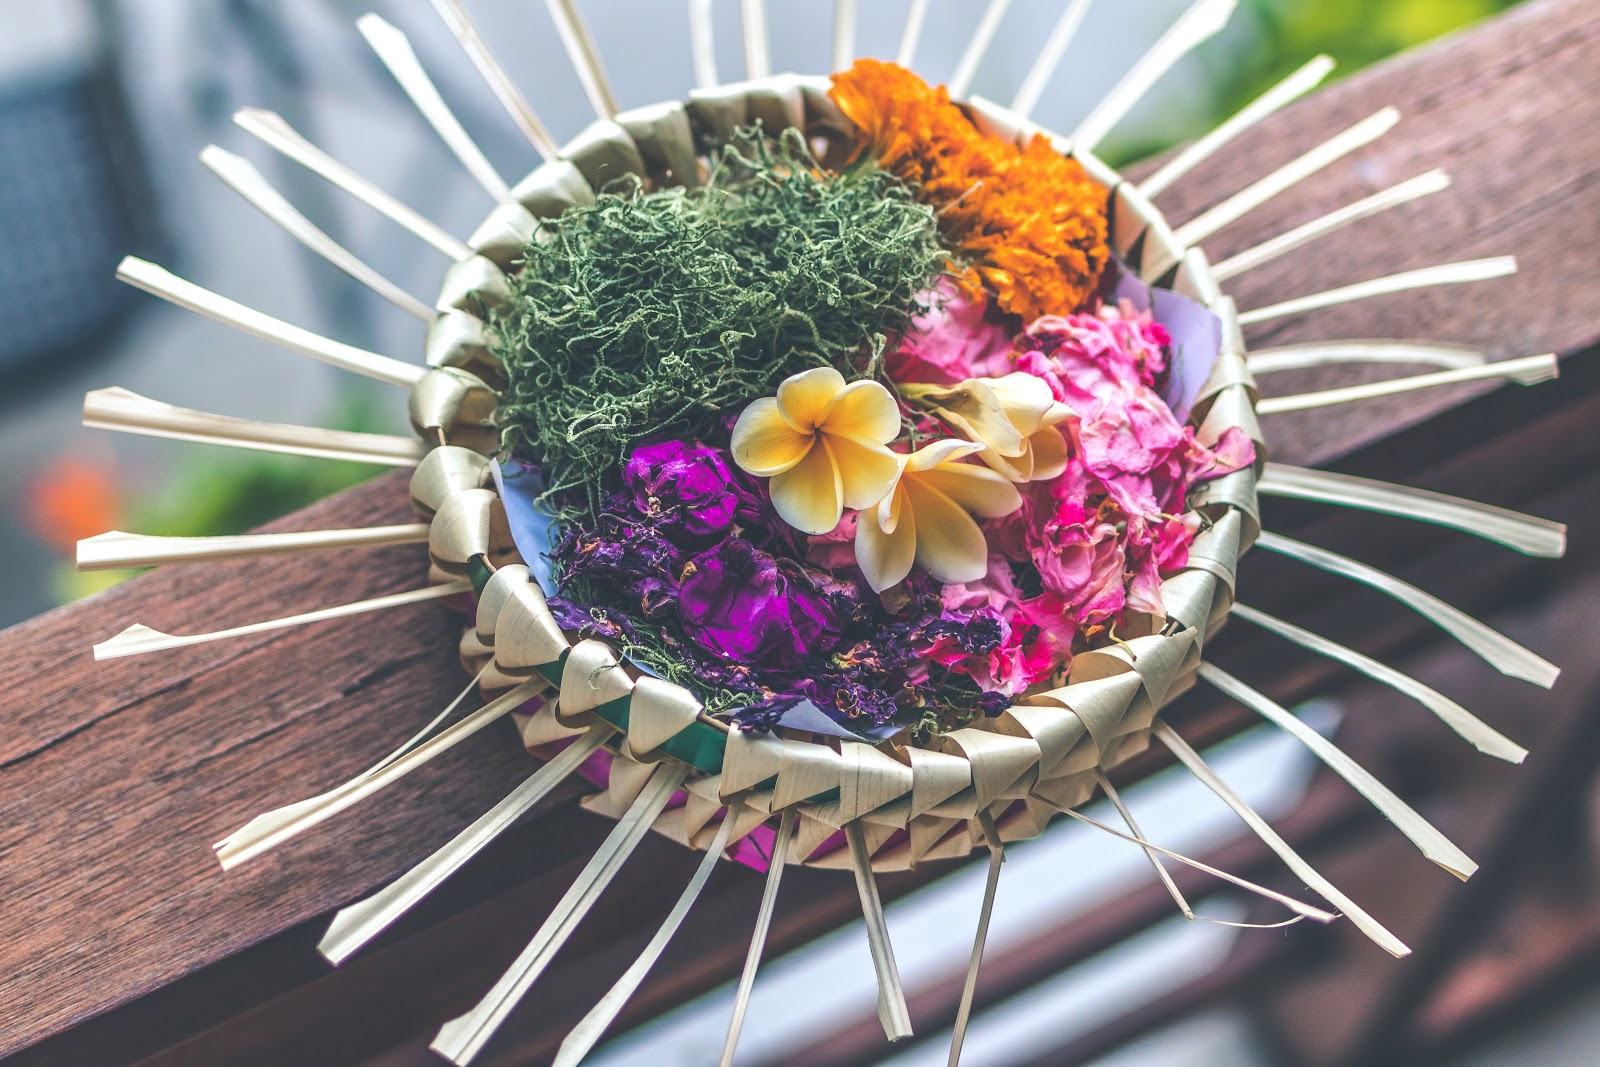 festive charisma focusing on floral aroma